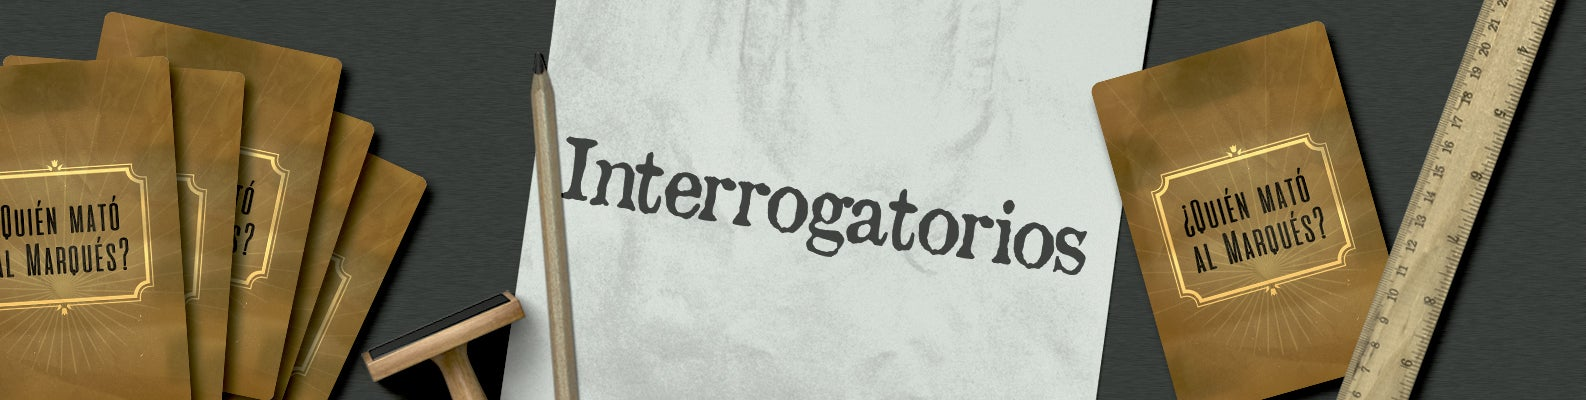 Interrogatorios